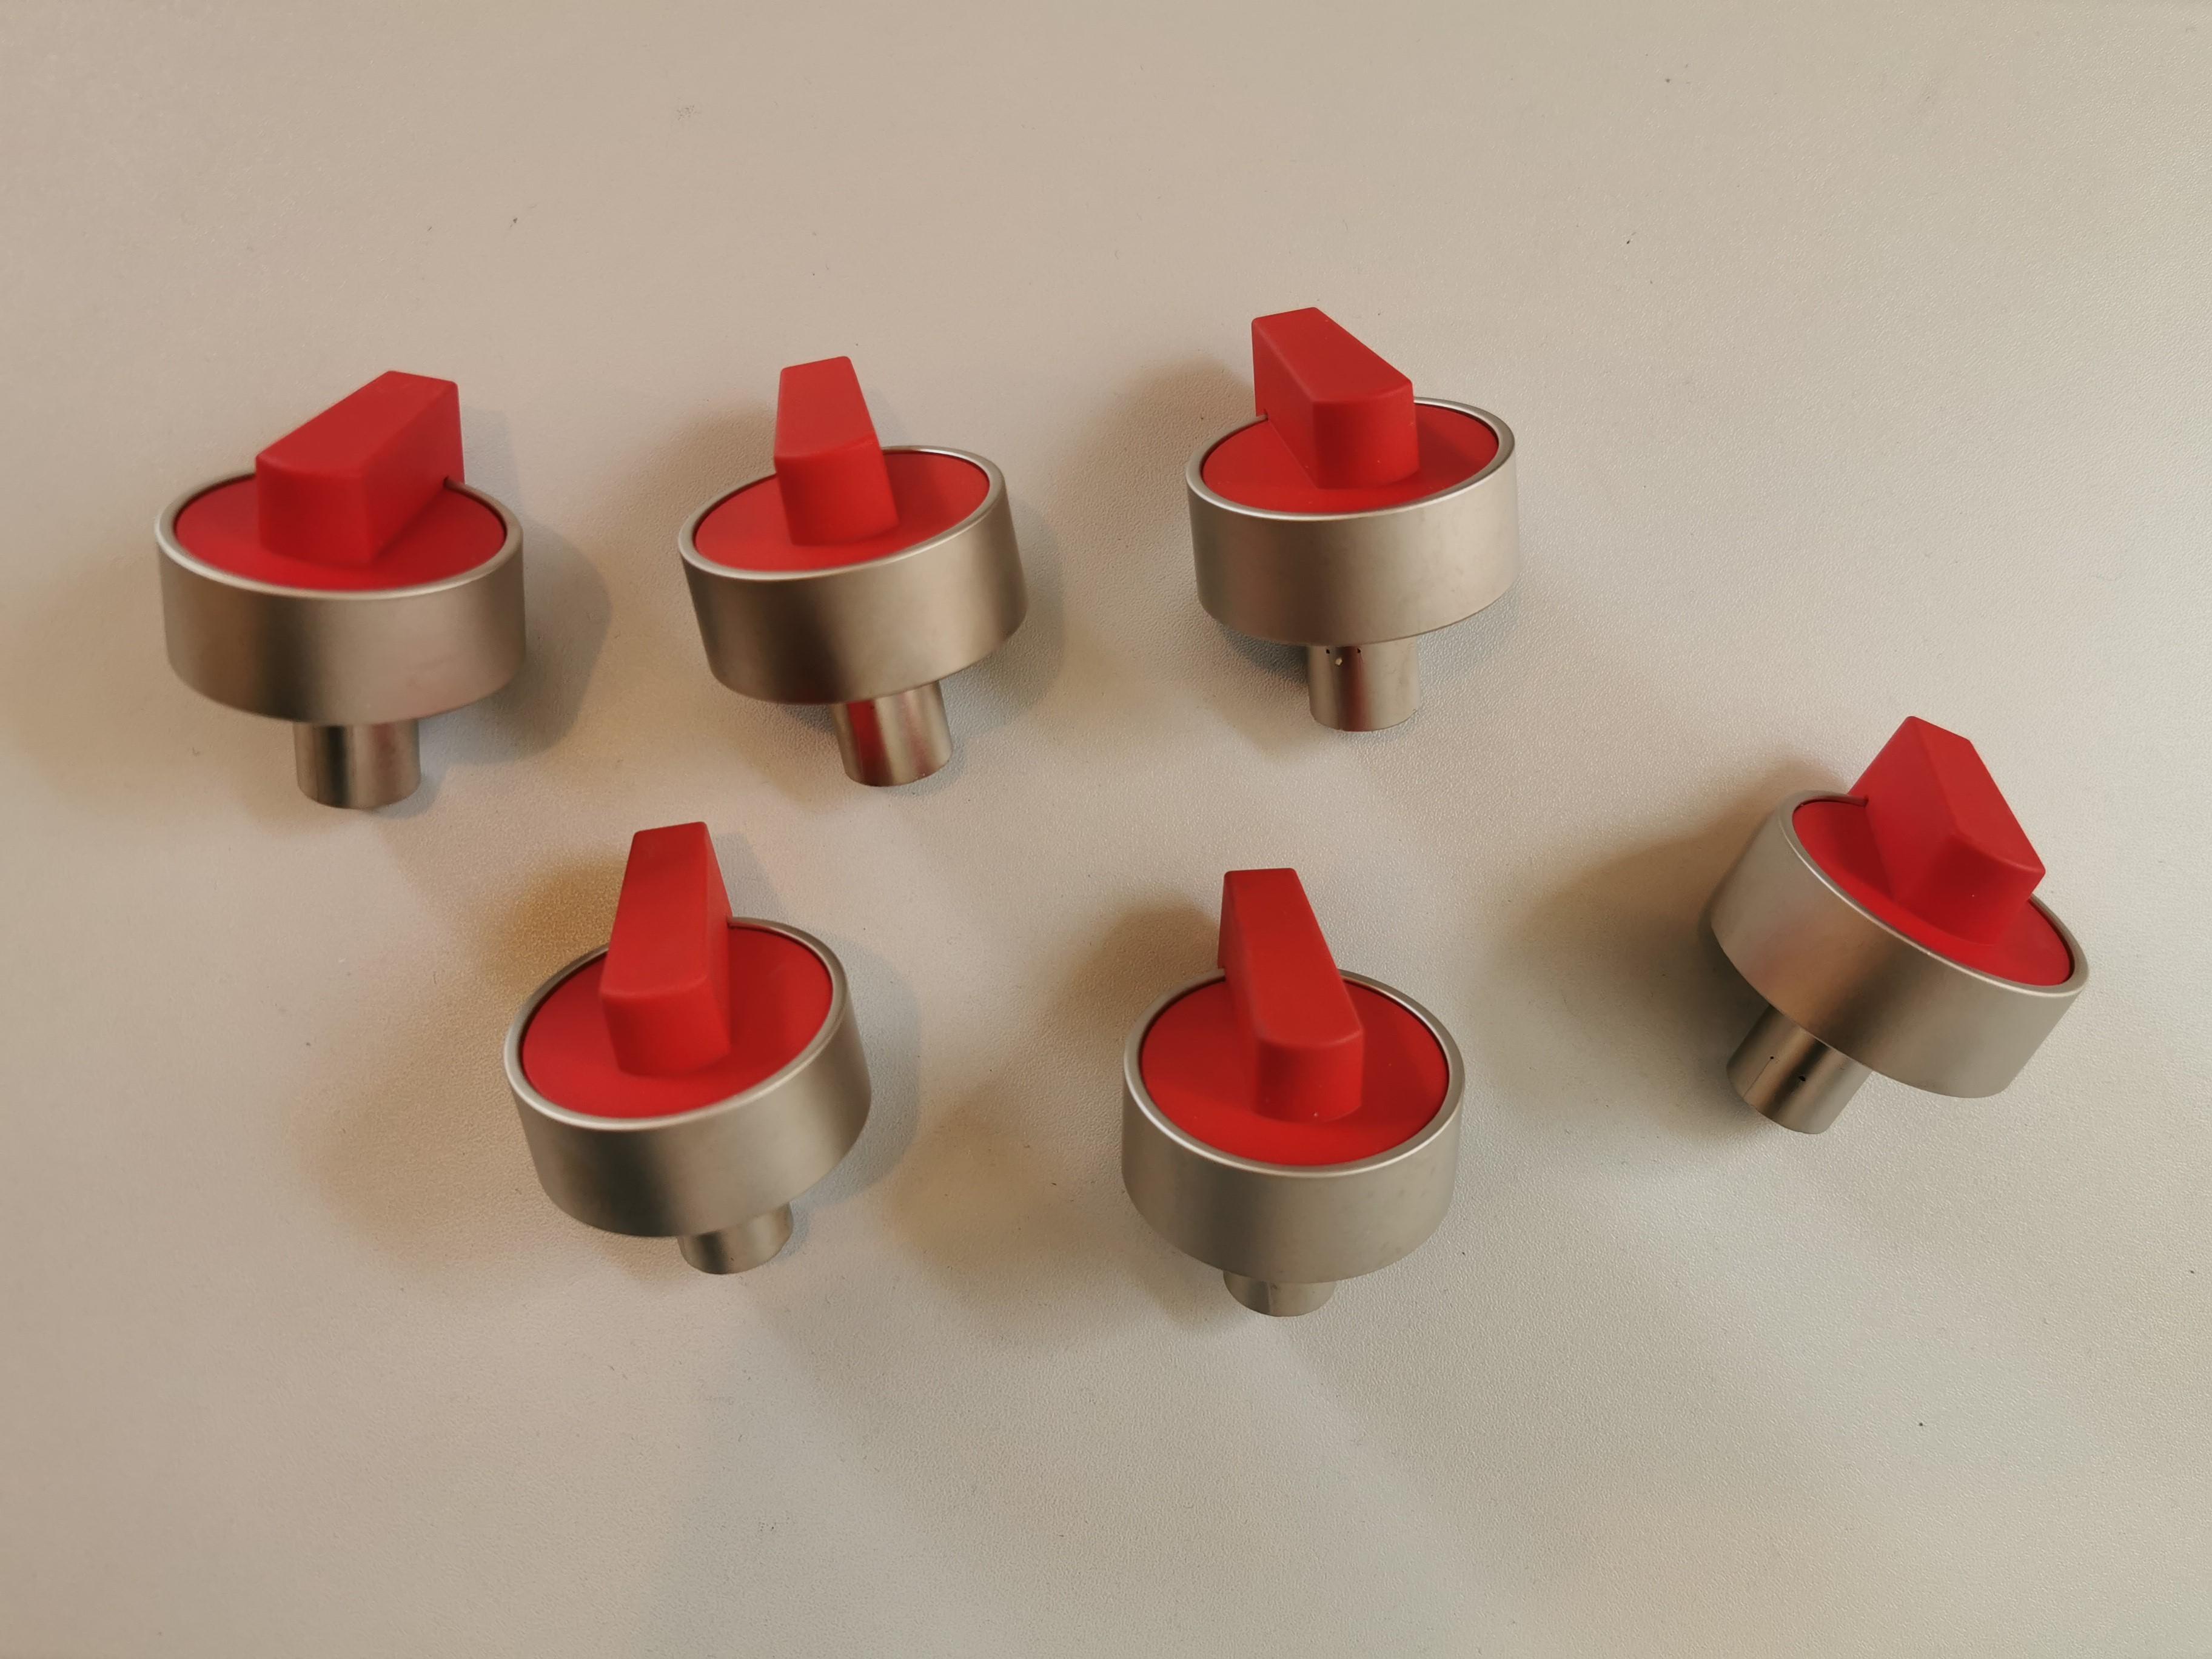 Set Knebel Silber/rot für LaGermania RI-Modelle